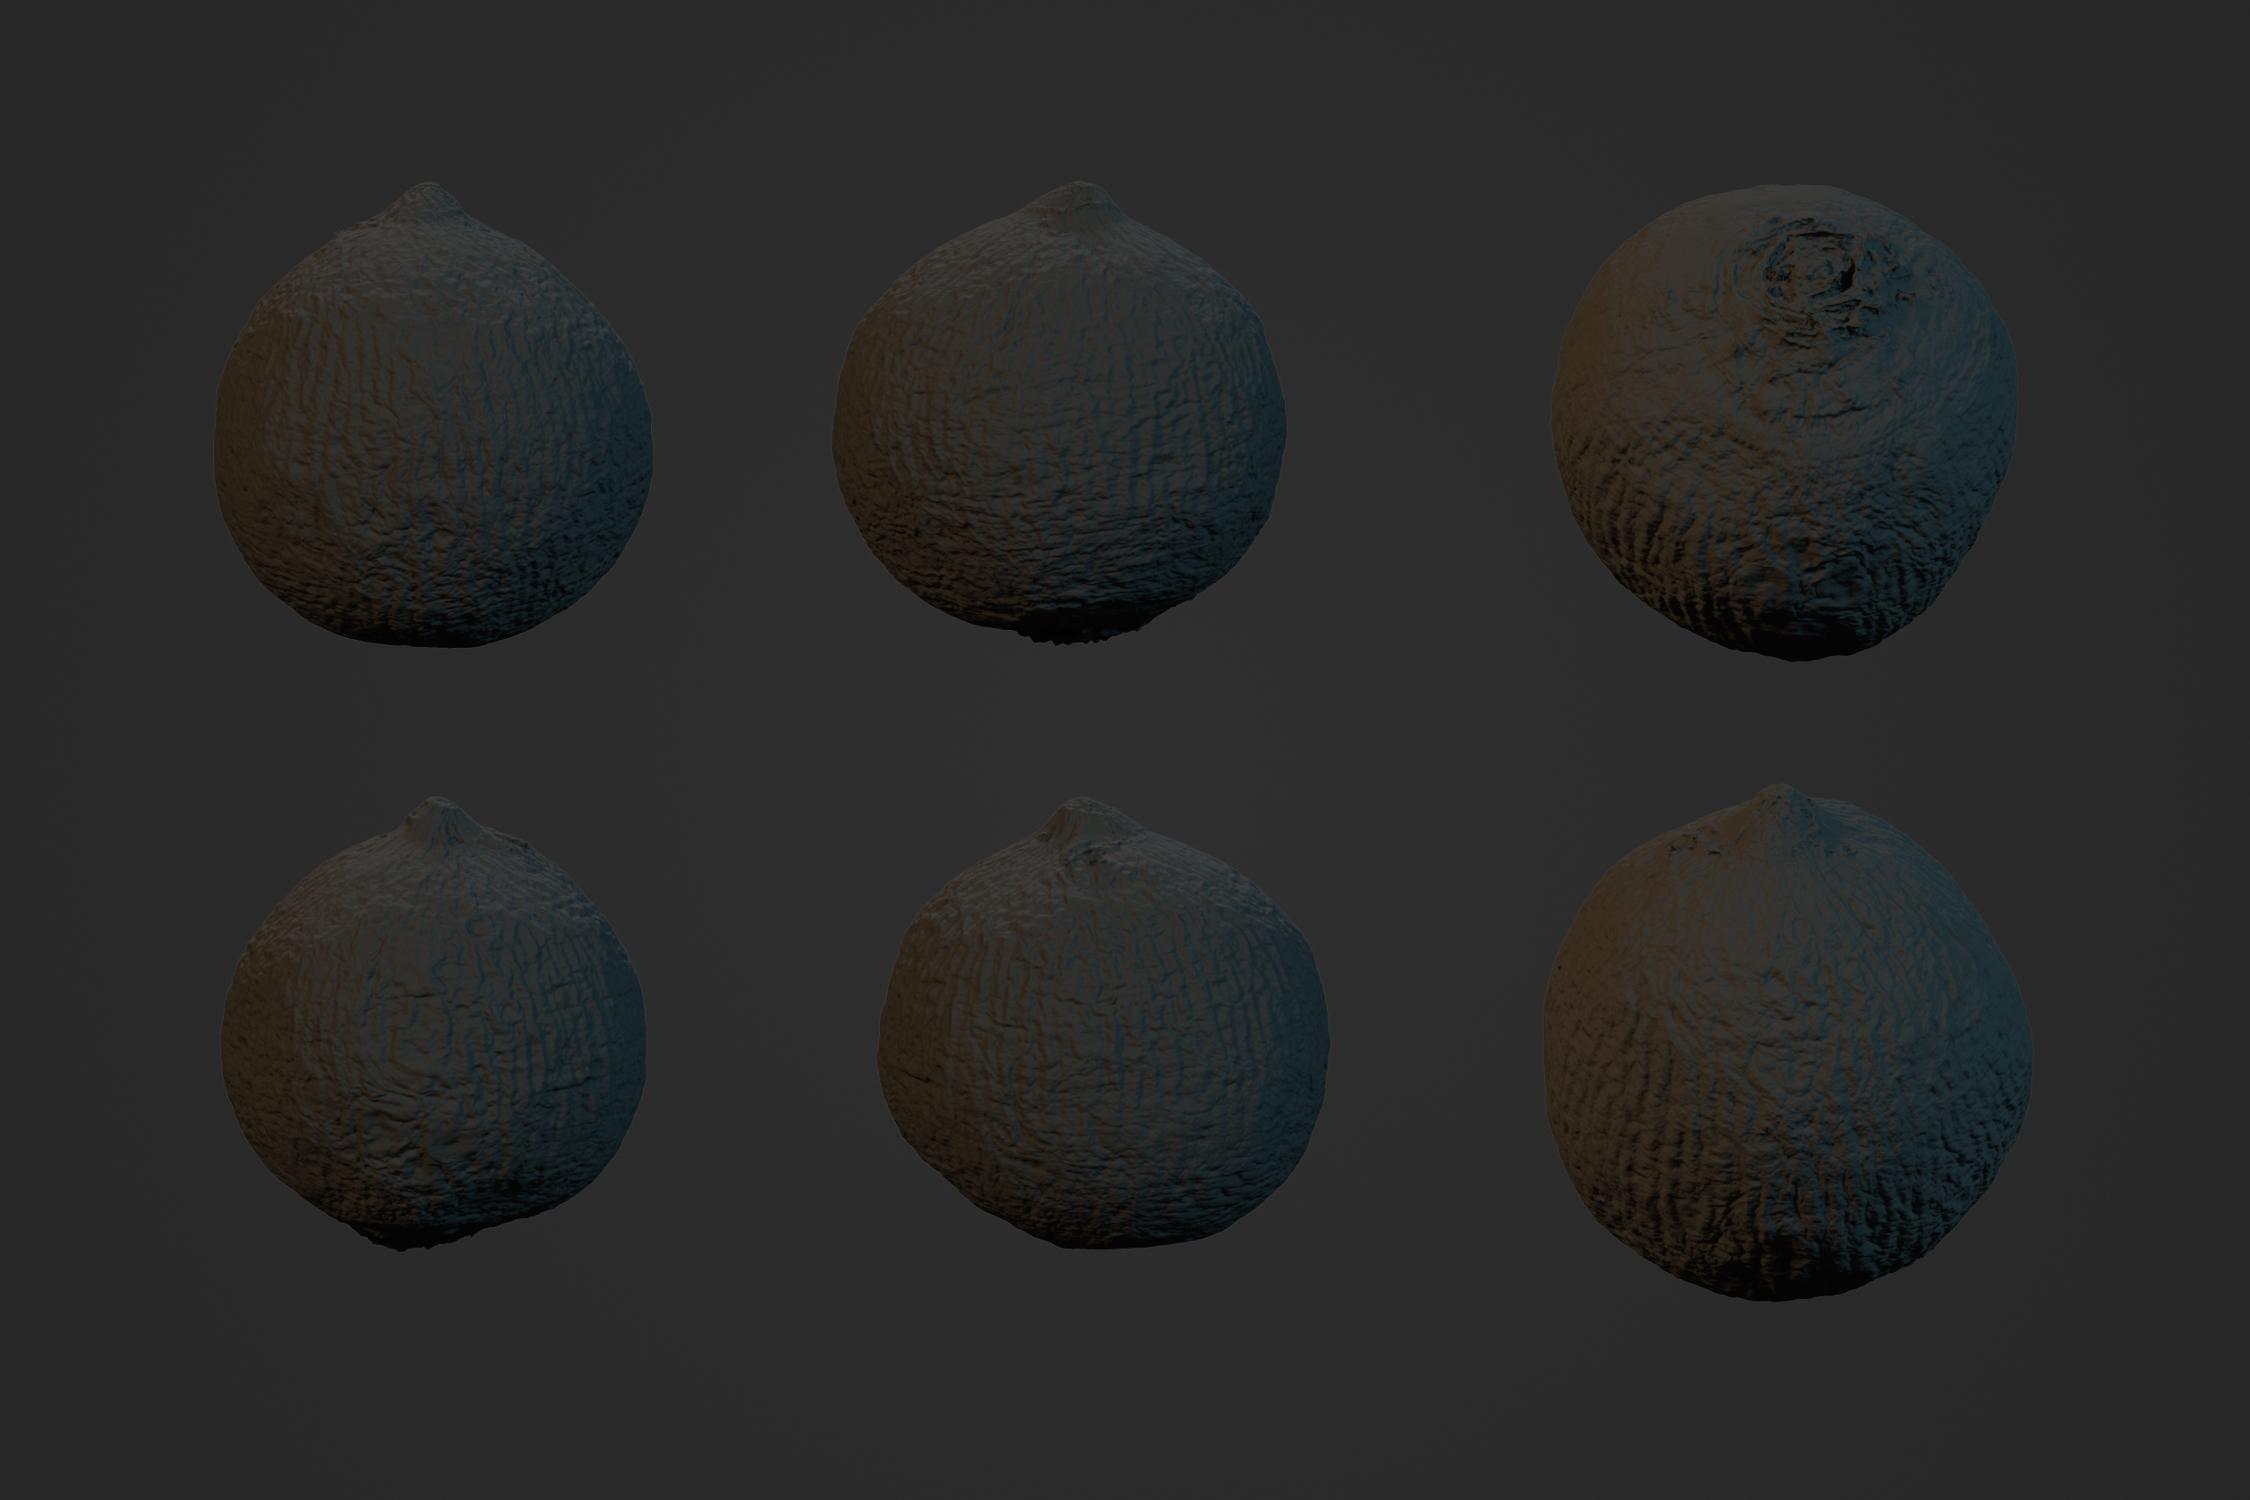 Turnip_1_0.jpg